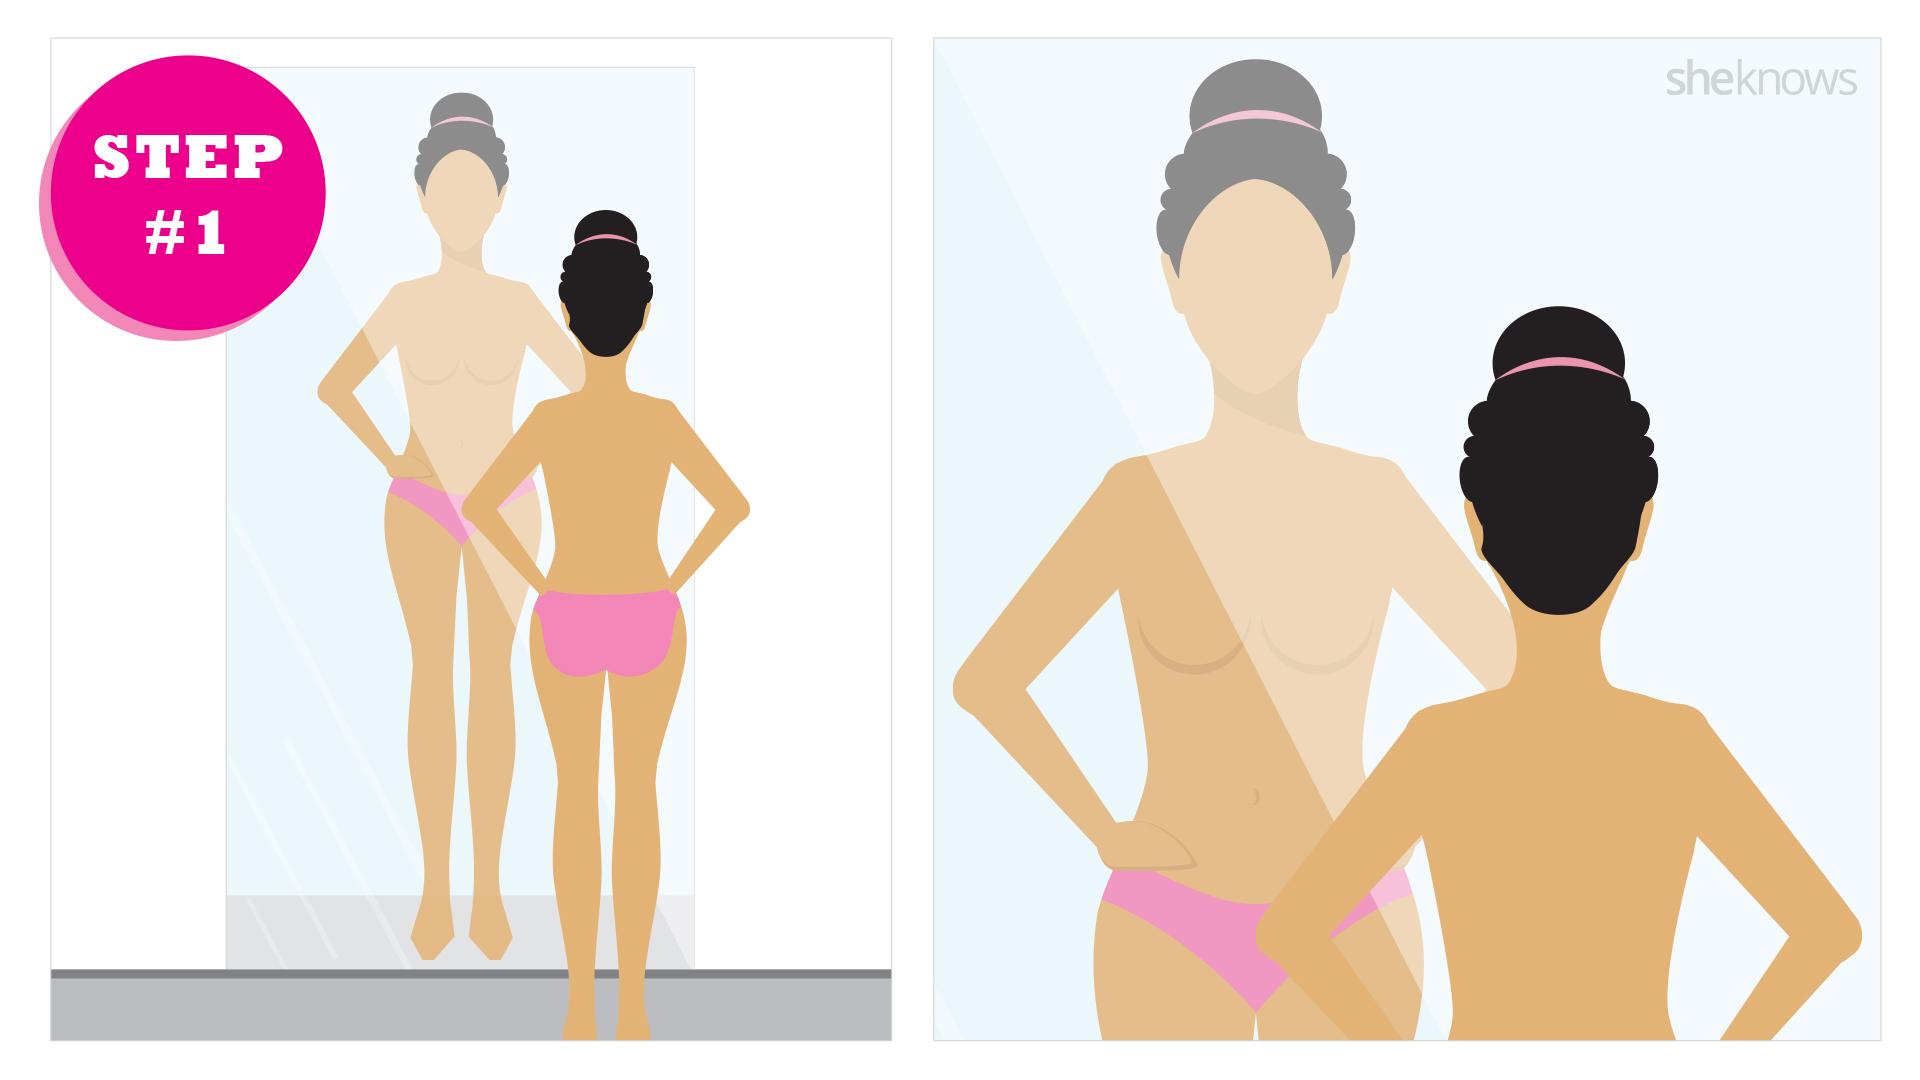 Breast self exam step 1